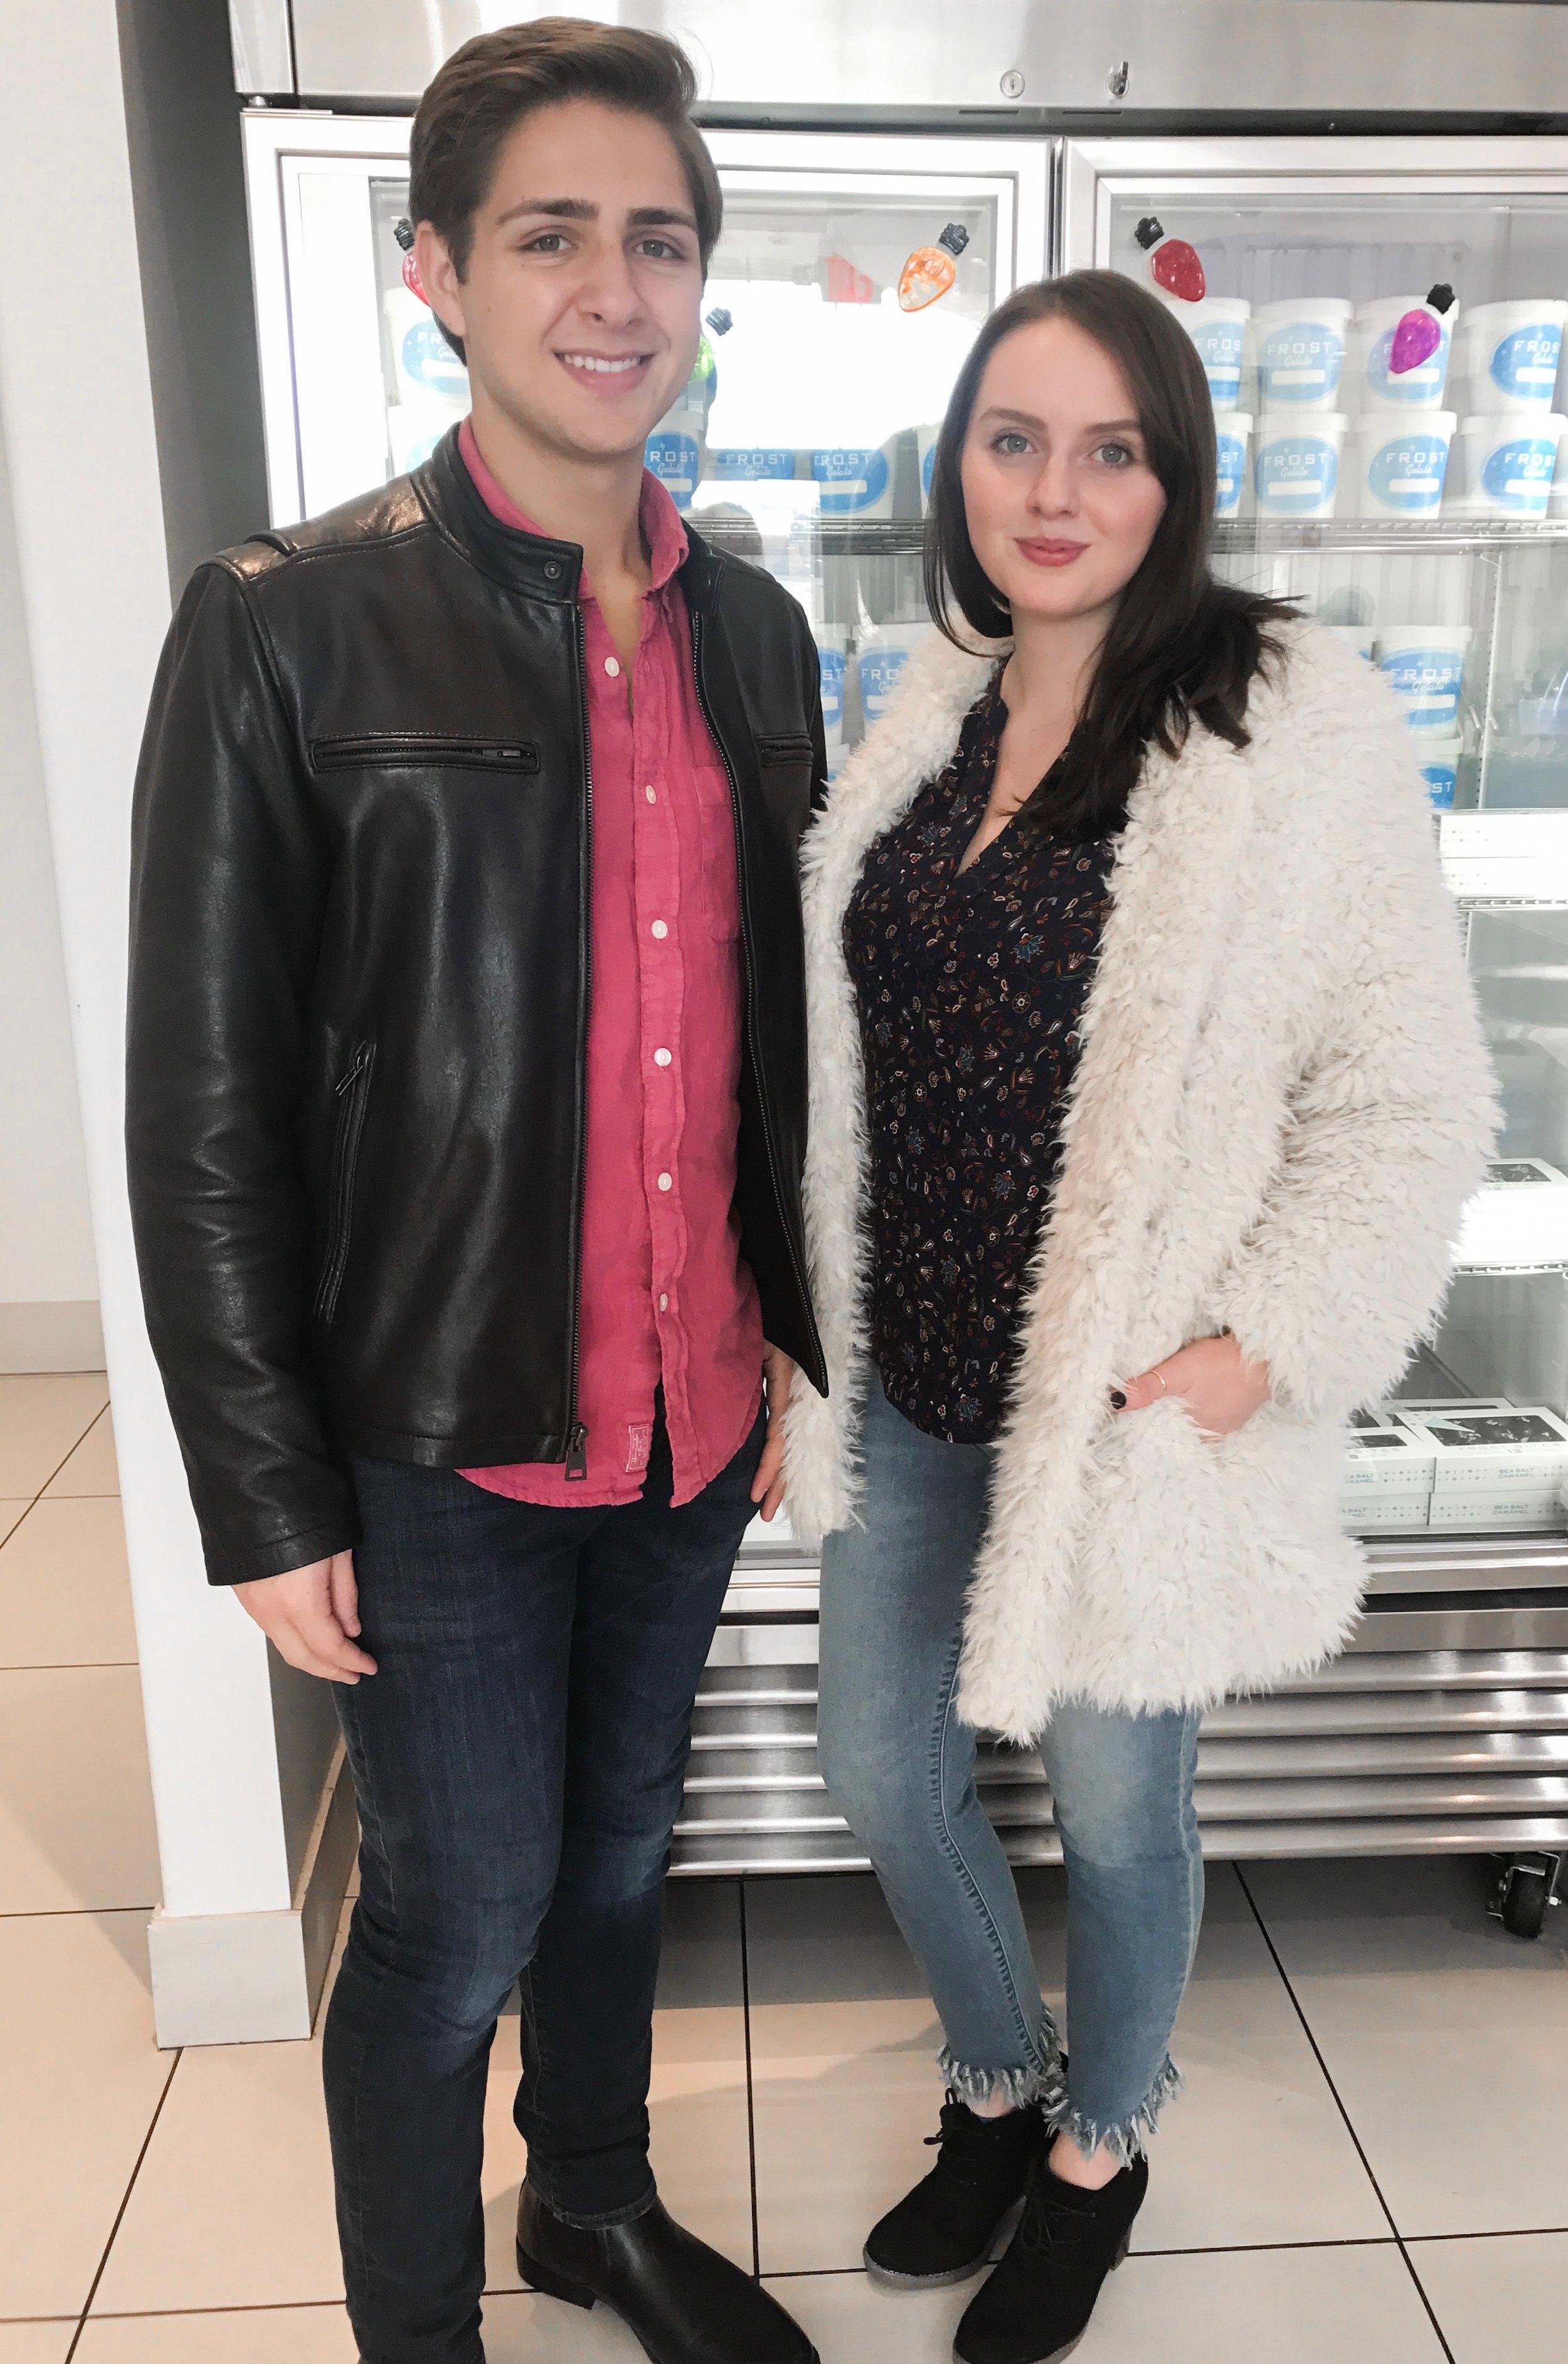 Model Johnny Bertuca & Blogger Macaila Britton